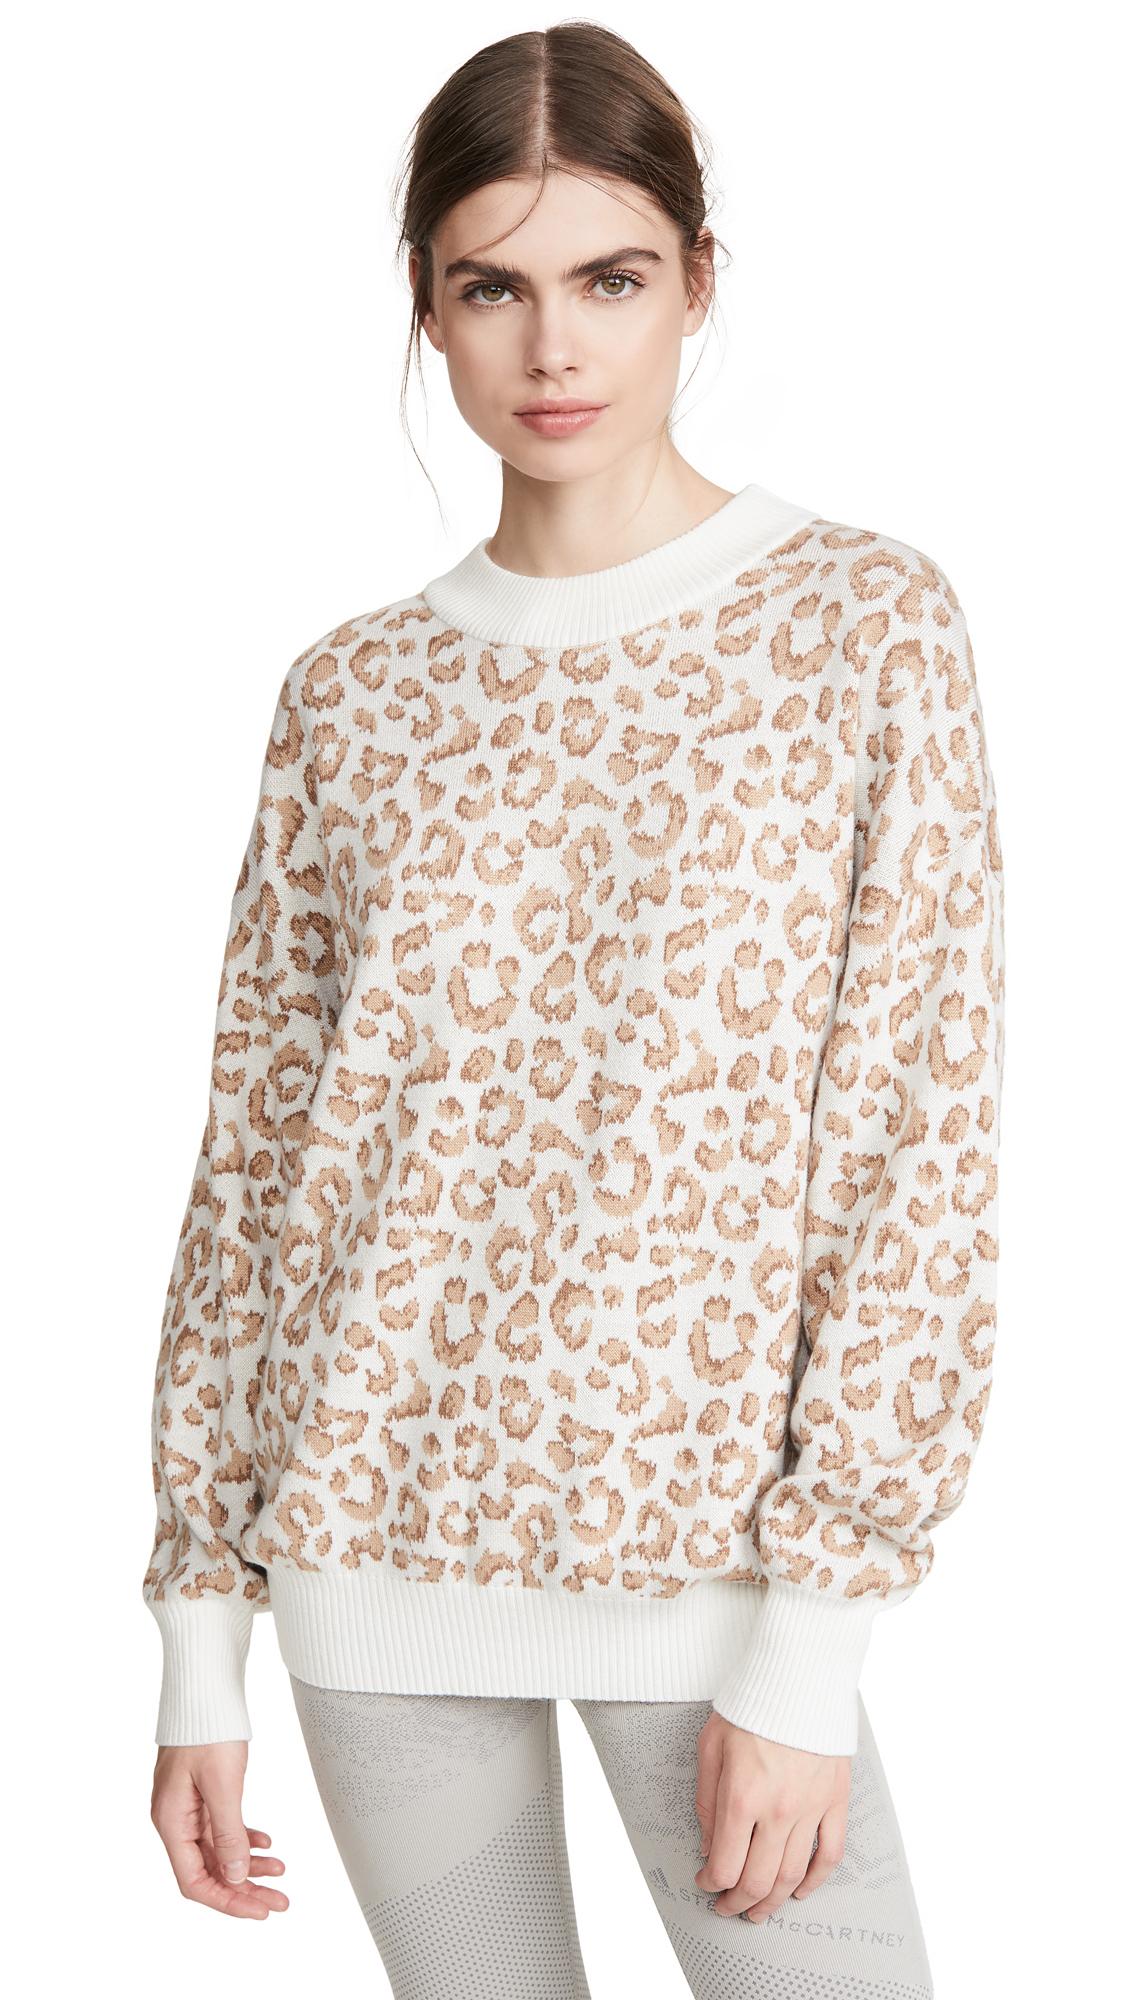 Varley Hermosa Sweater - 30% Off Sale